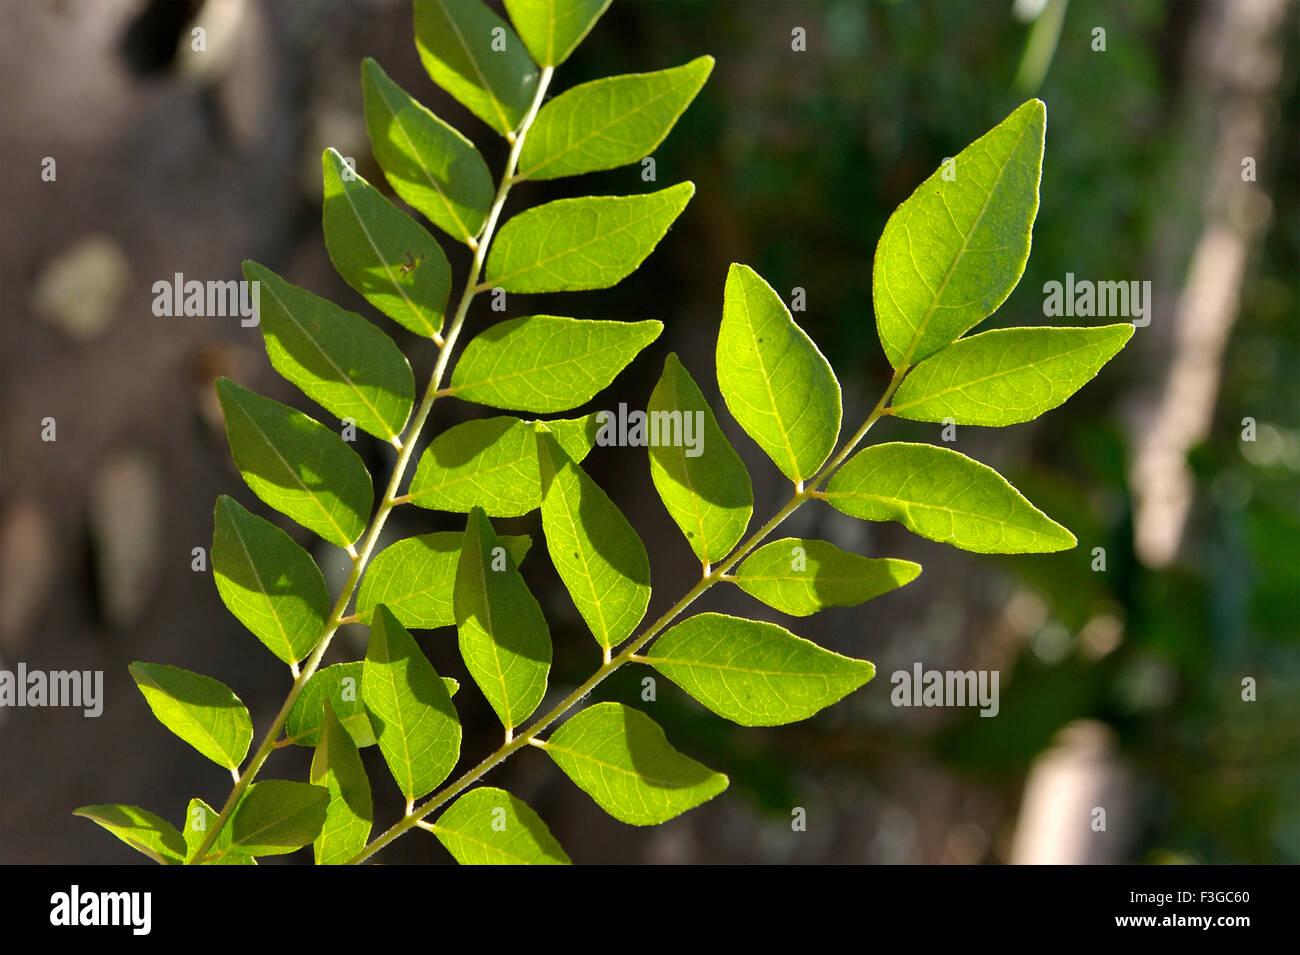 Medicinal plant ; green neem ; Melia Azadirachta Lin - Stock Image